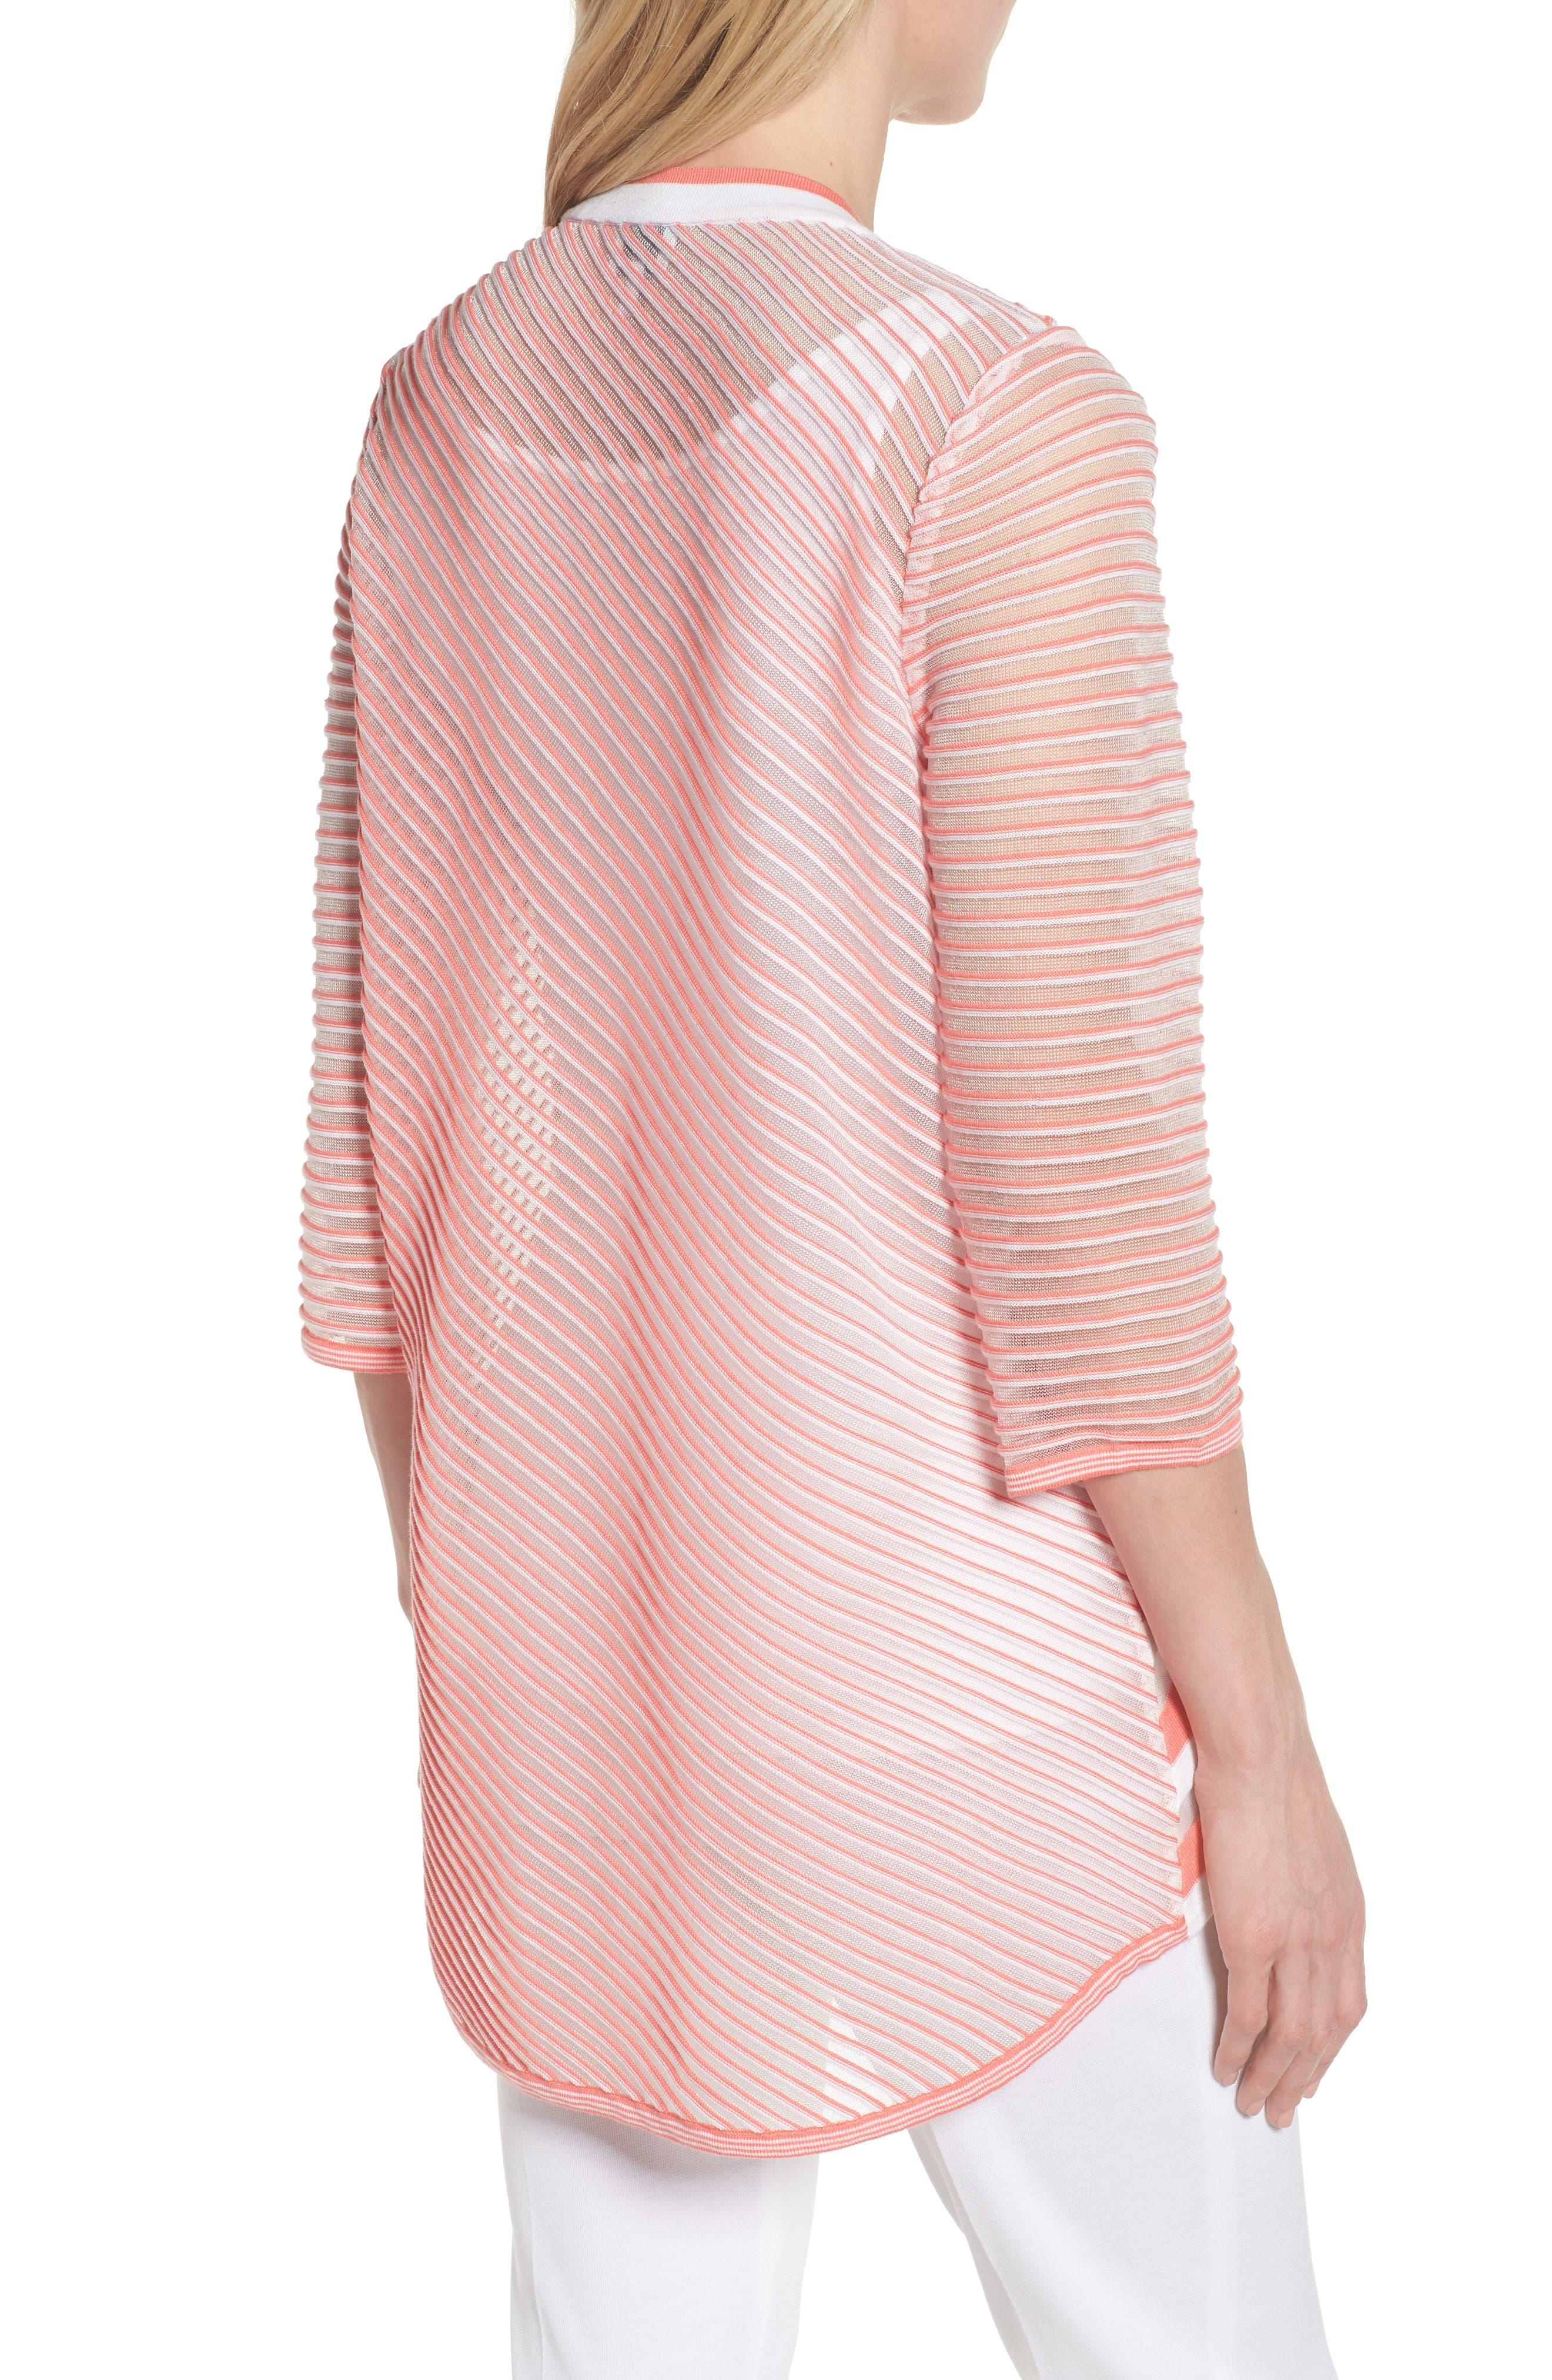 Sheer Stripe Knit Tunic,                             Alternate thumbnail 2, color,                             Daylily/ White